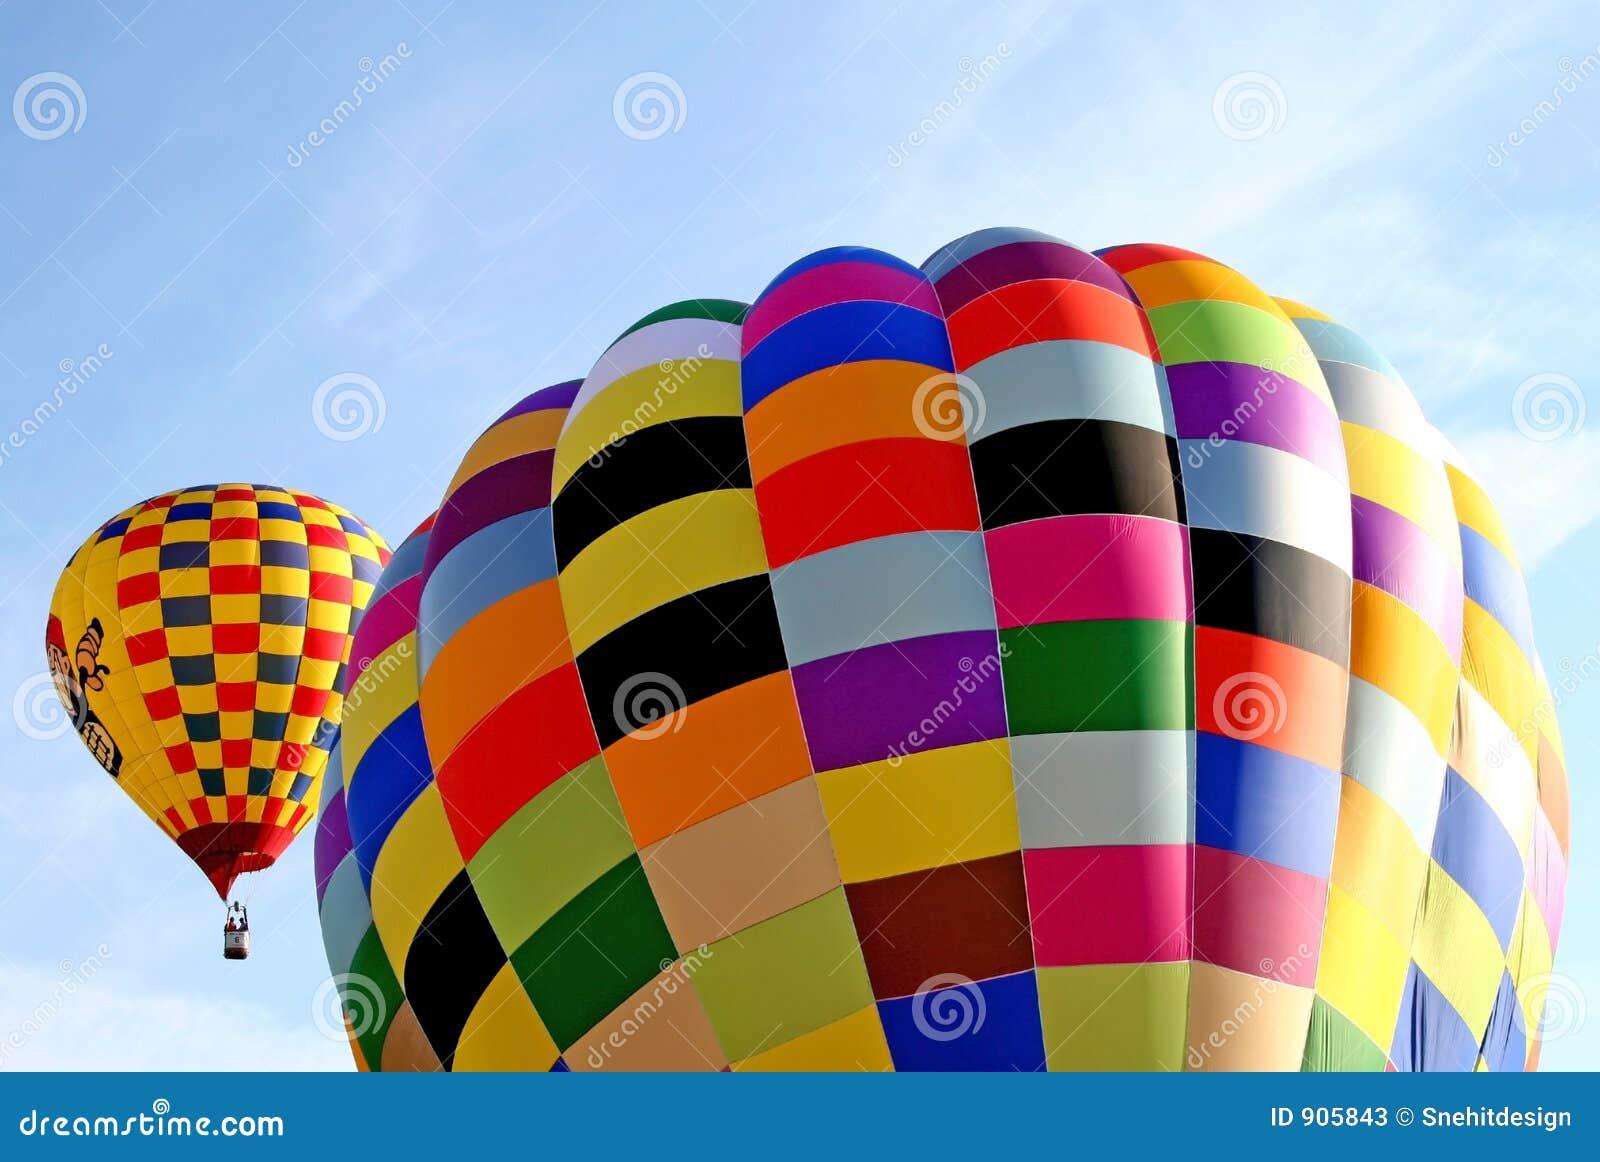 Ballon coloré